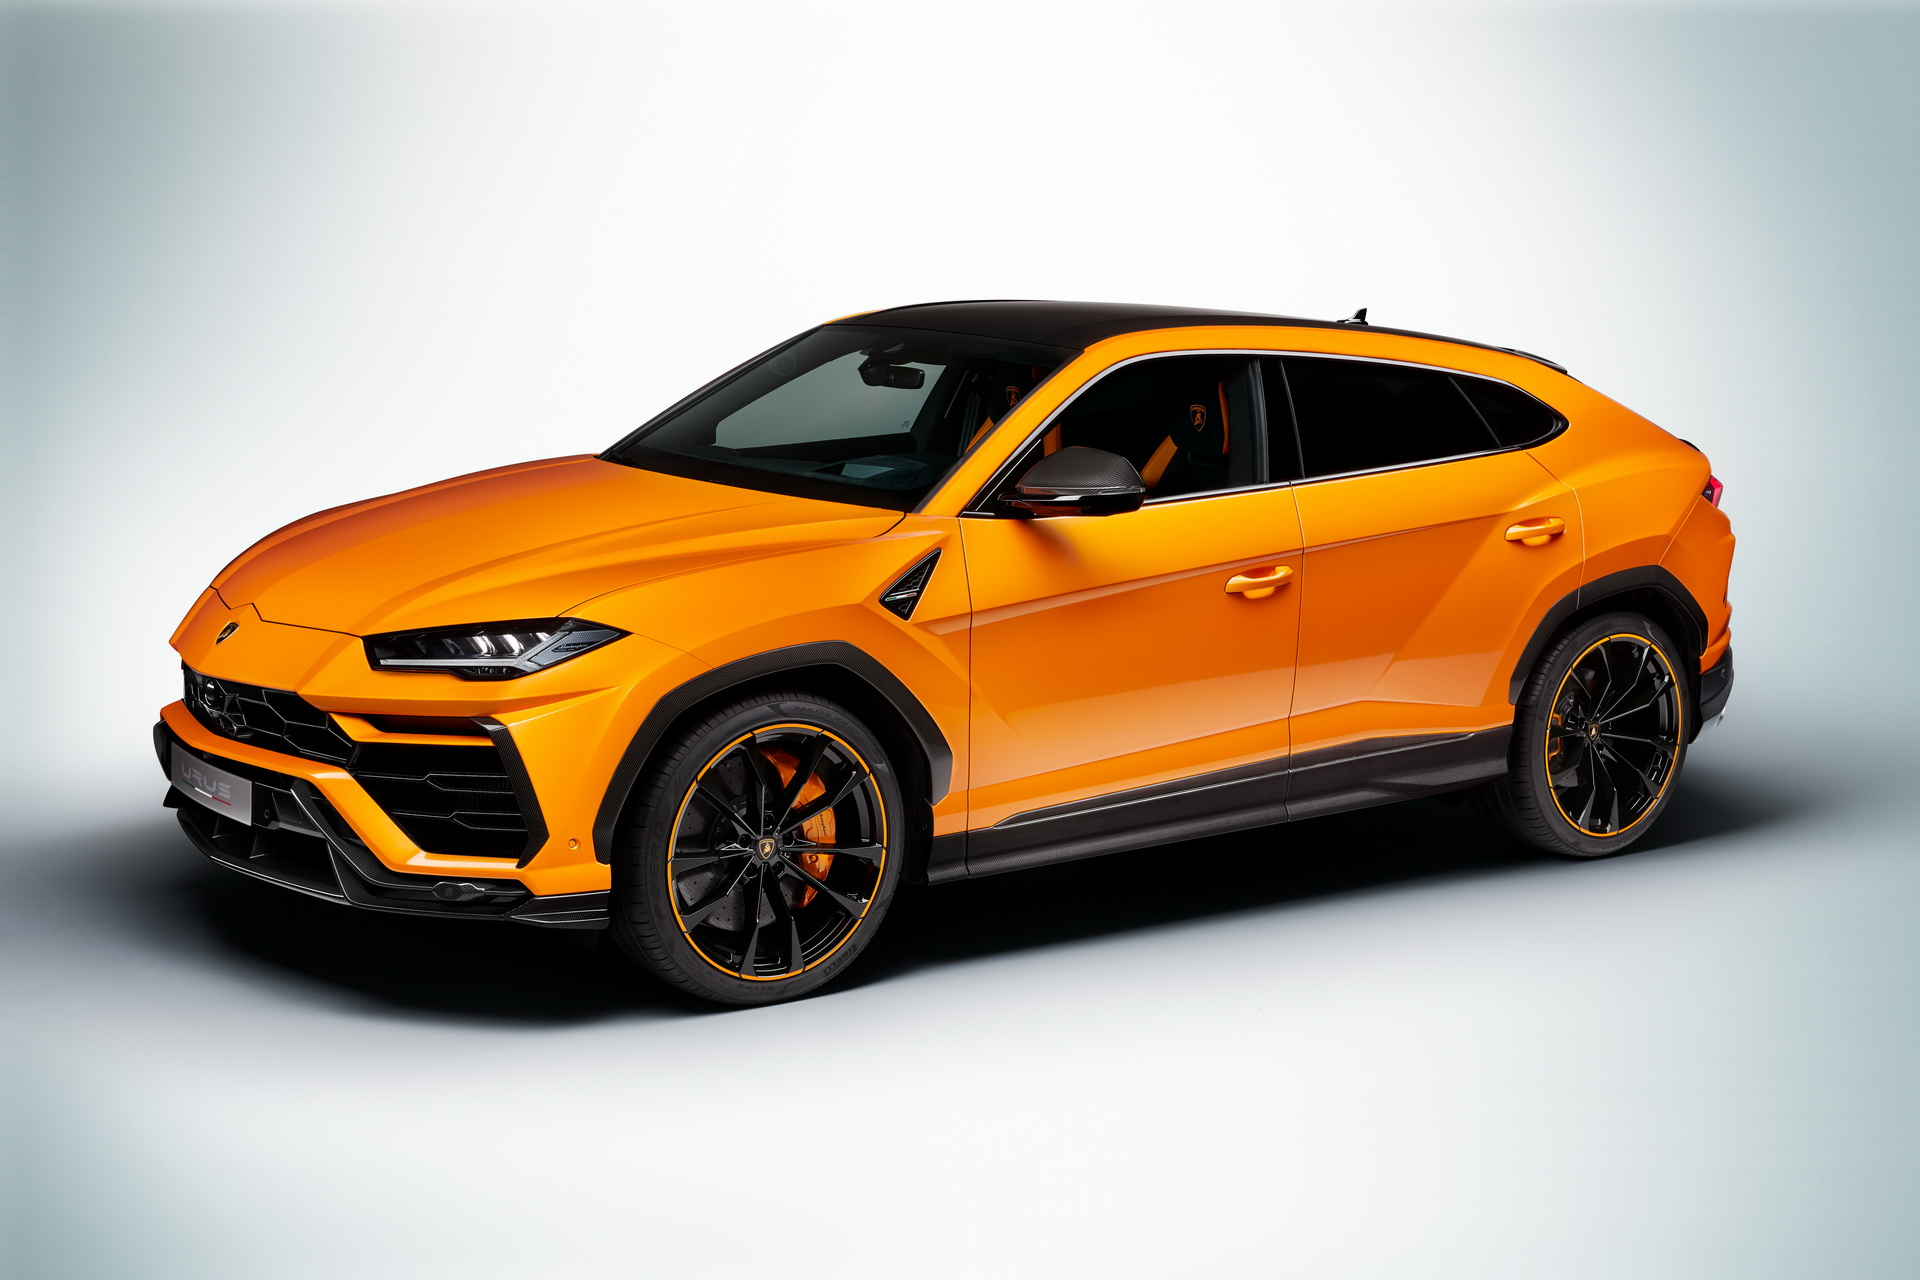 Lamborghini-Urus-Pearl-Capsule-Edition-11